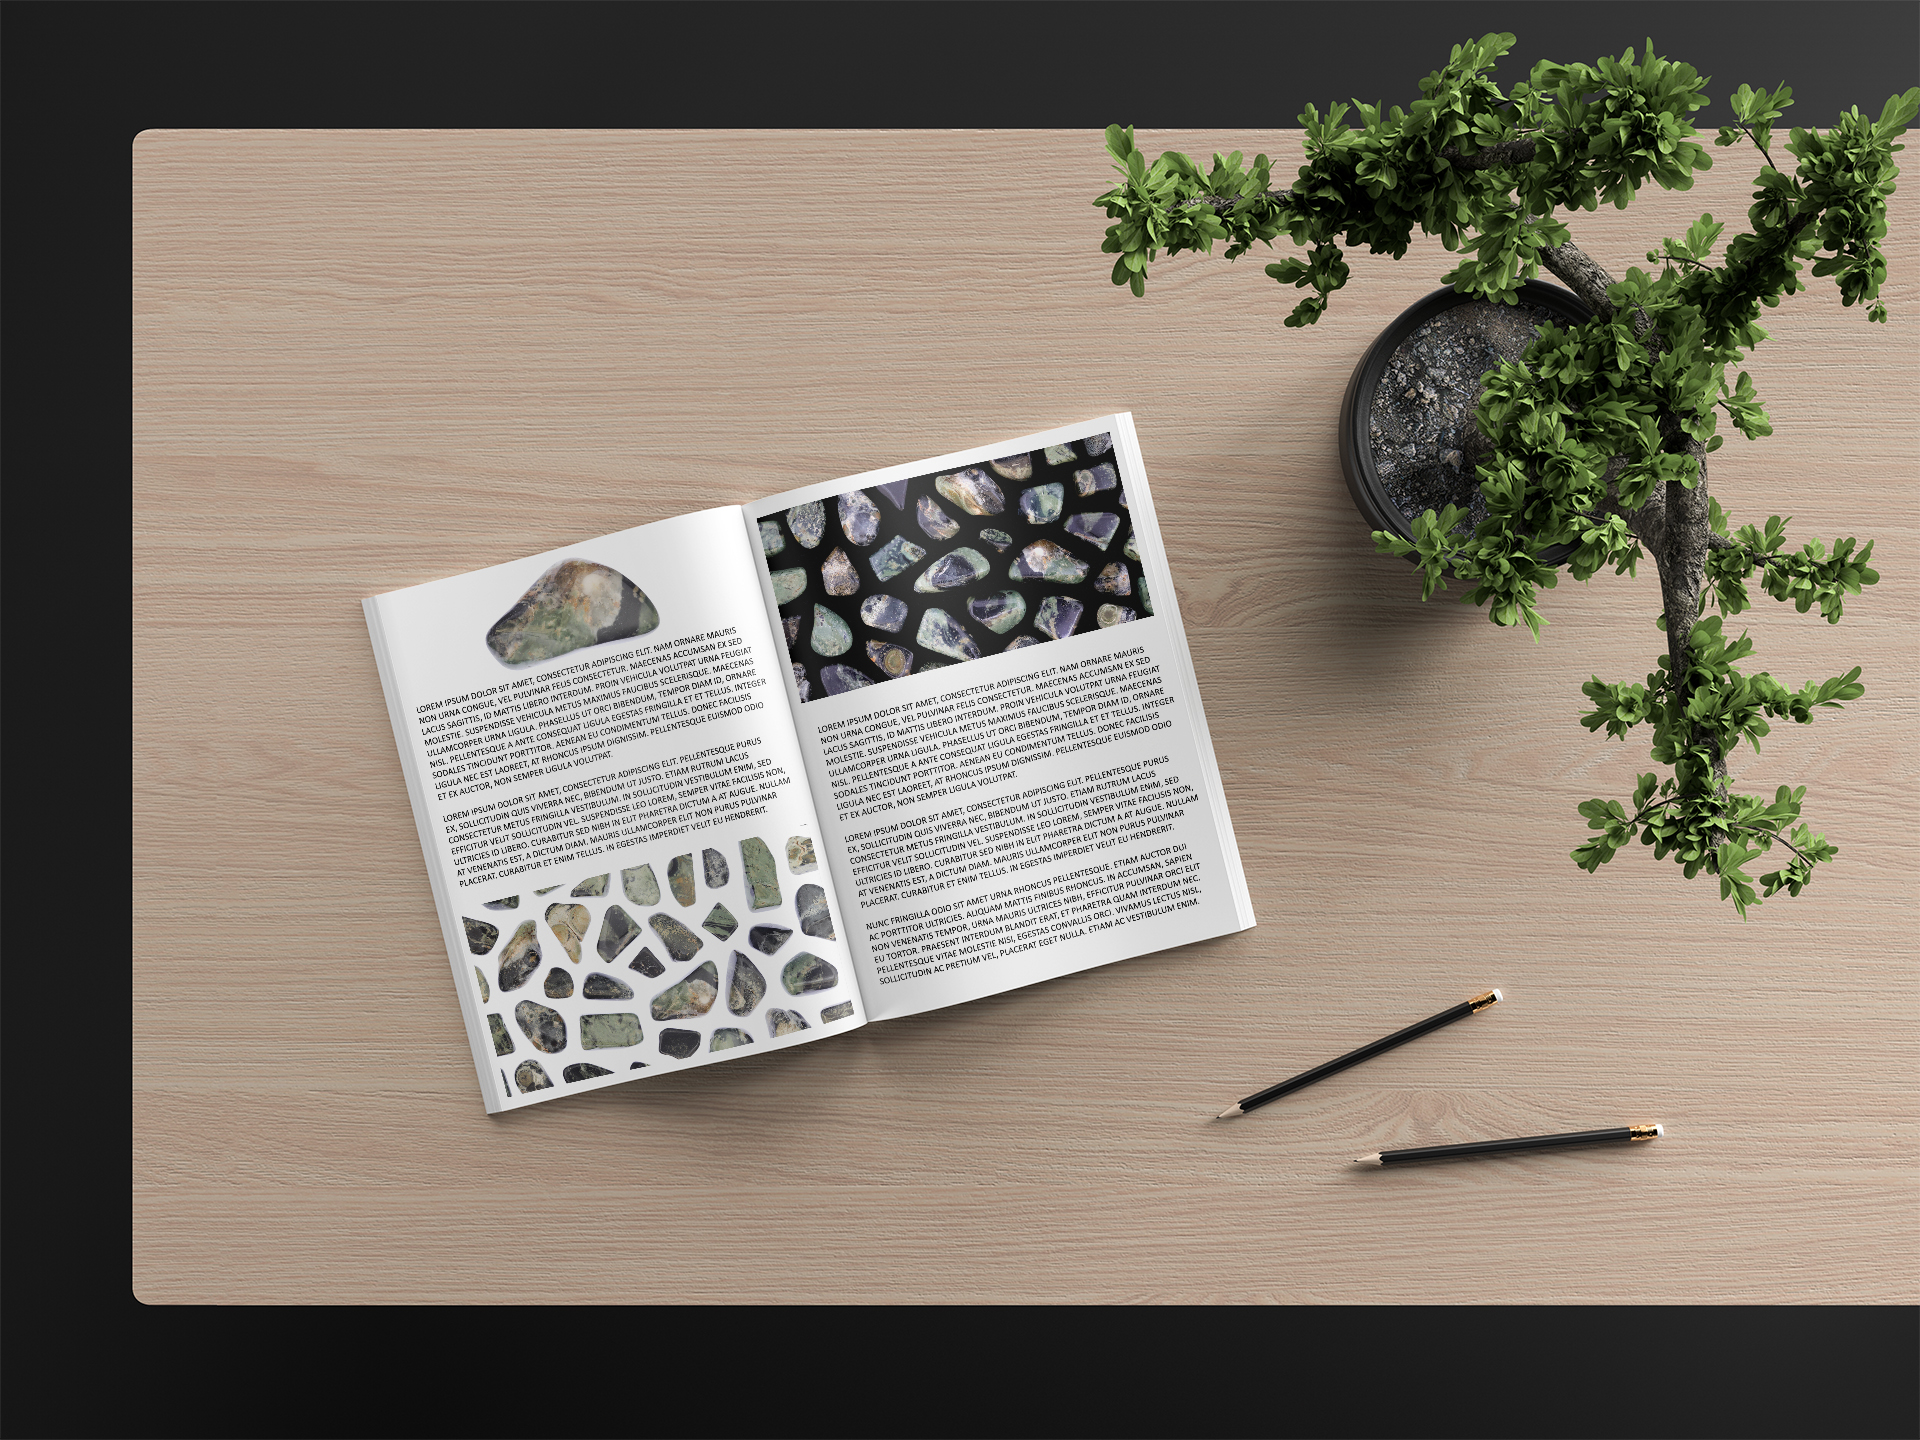 Kambaba Jasper Background Textures Modern Magazine Article Illustrations Preview